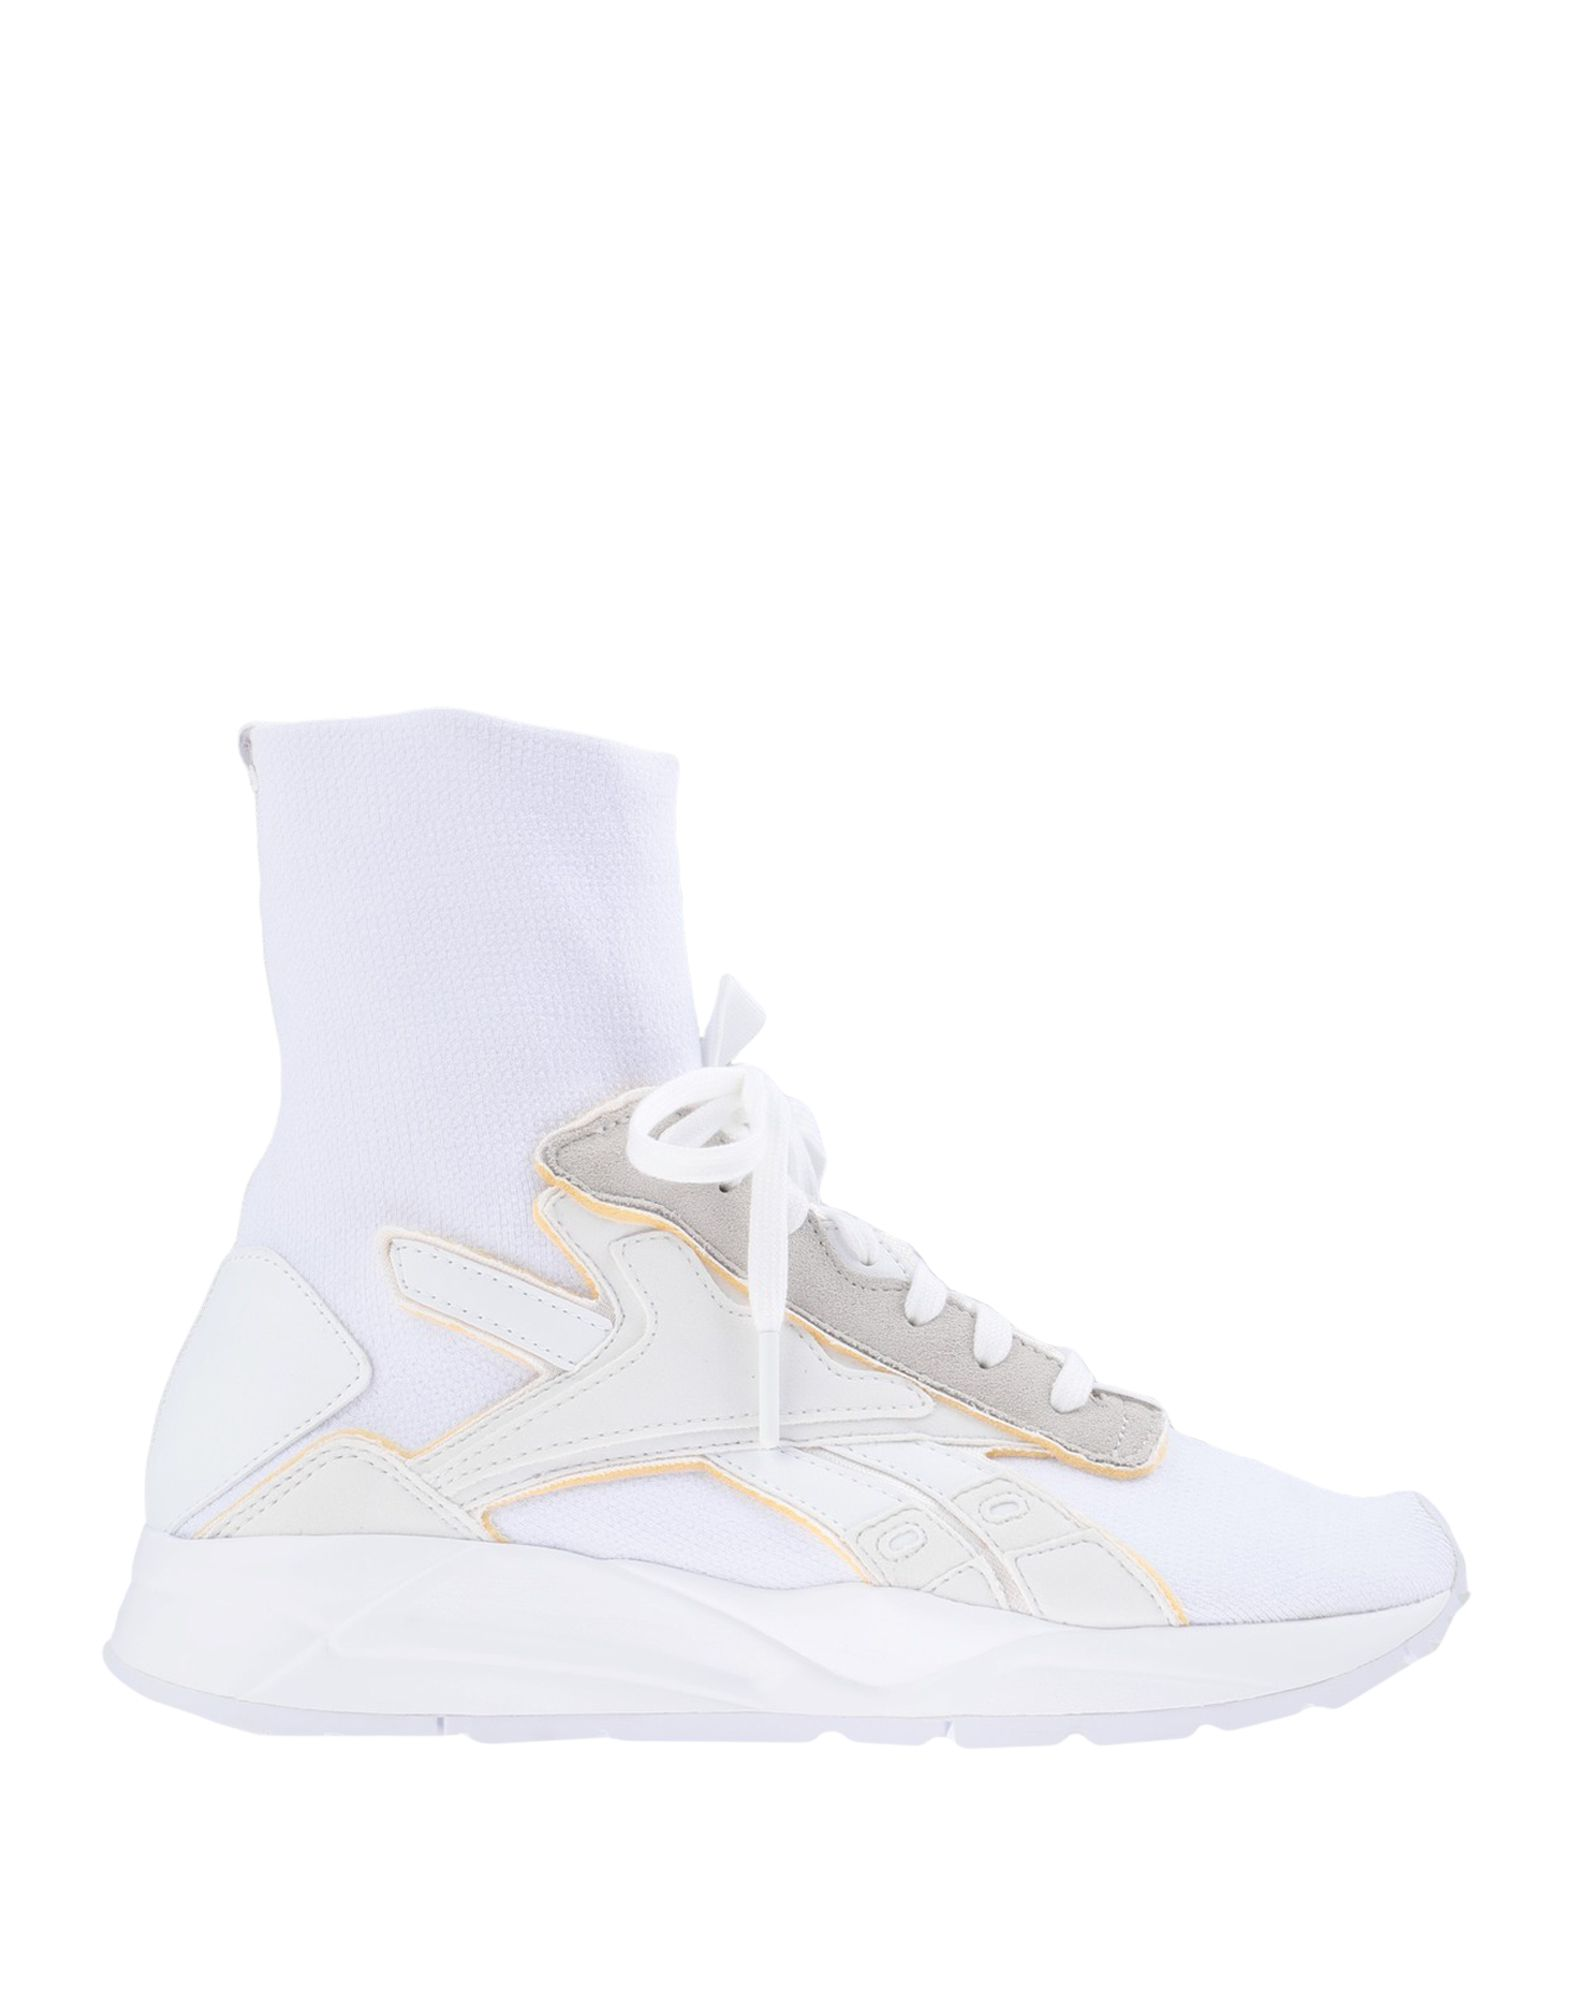 REEBOK x VICTORIA BECKHAM Высокие кеды и кроссовки кроссовки reebok cl nylon color